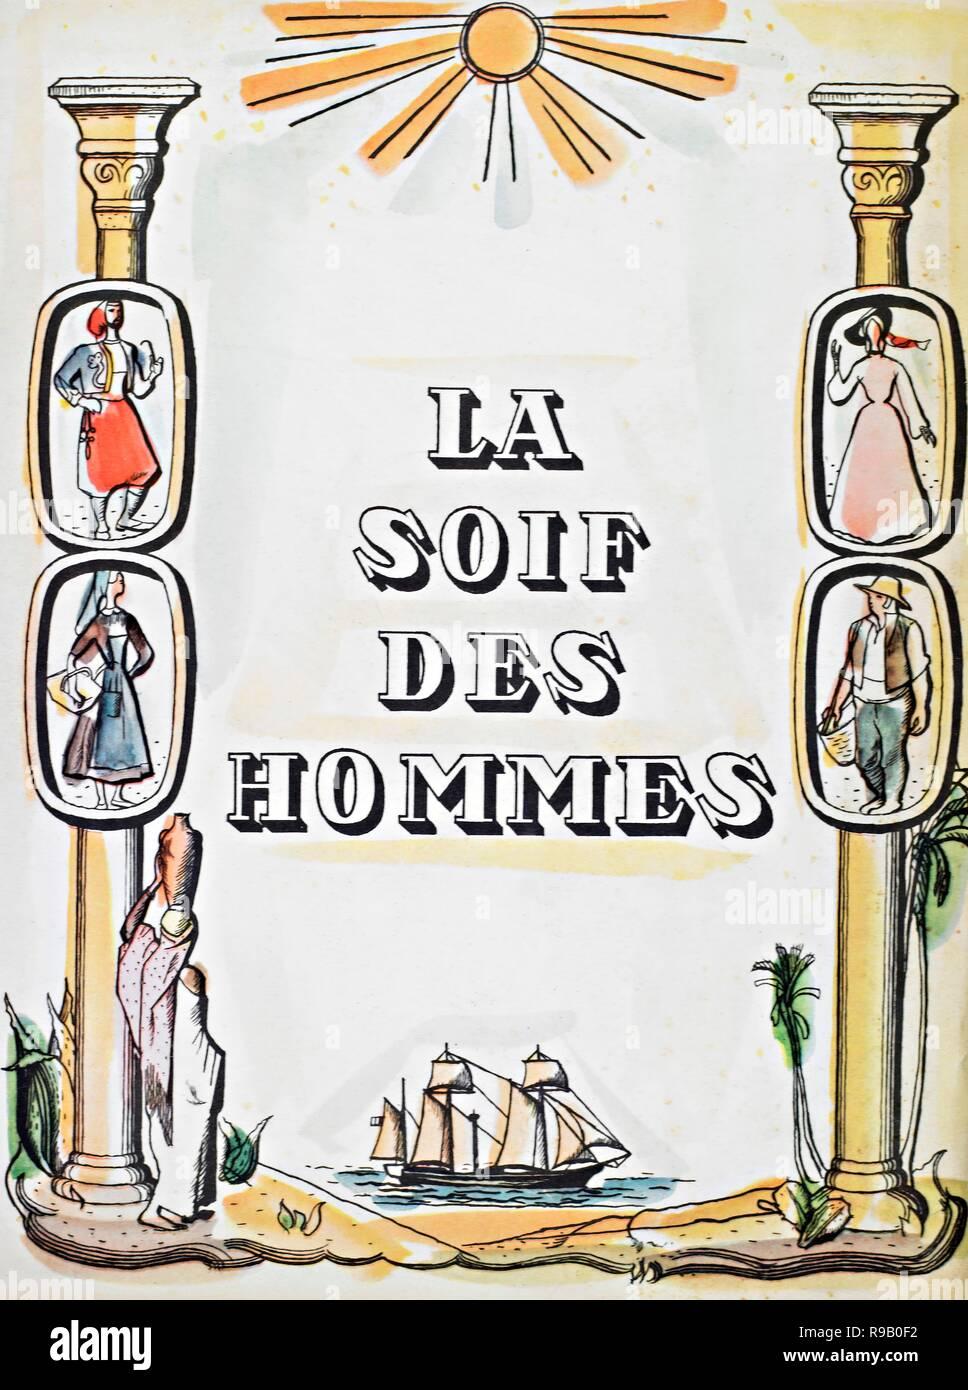 Original film title: LA SOIF DES HOMMES. English title: THIRST OF MEN. Year: 1950. Director: SERGE DE POLIGNY. Credit: CINE SELECTION / Album - Stock Image